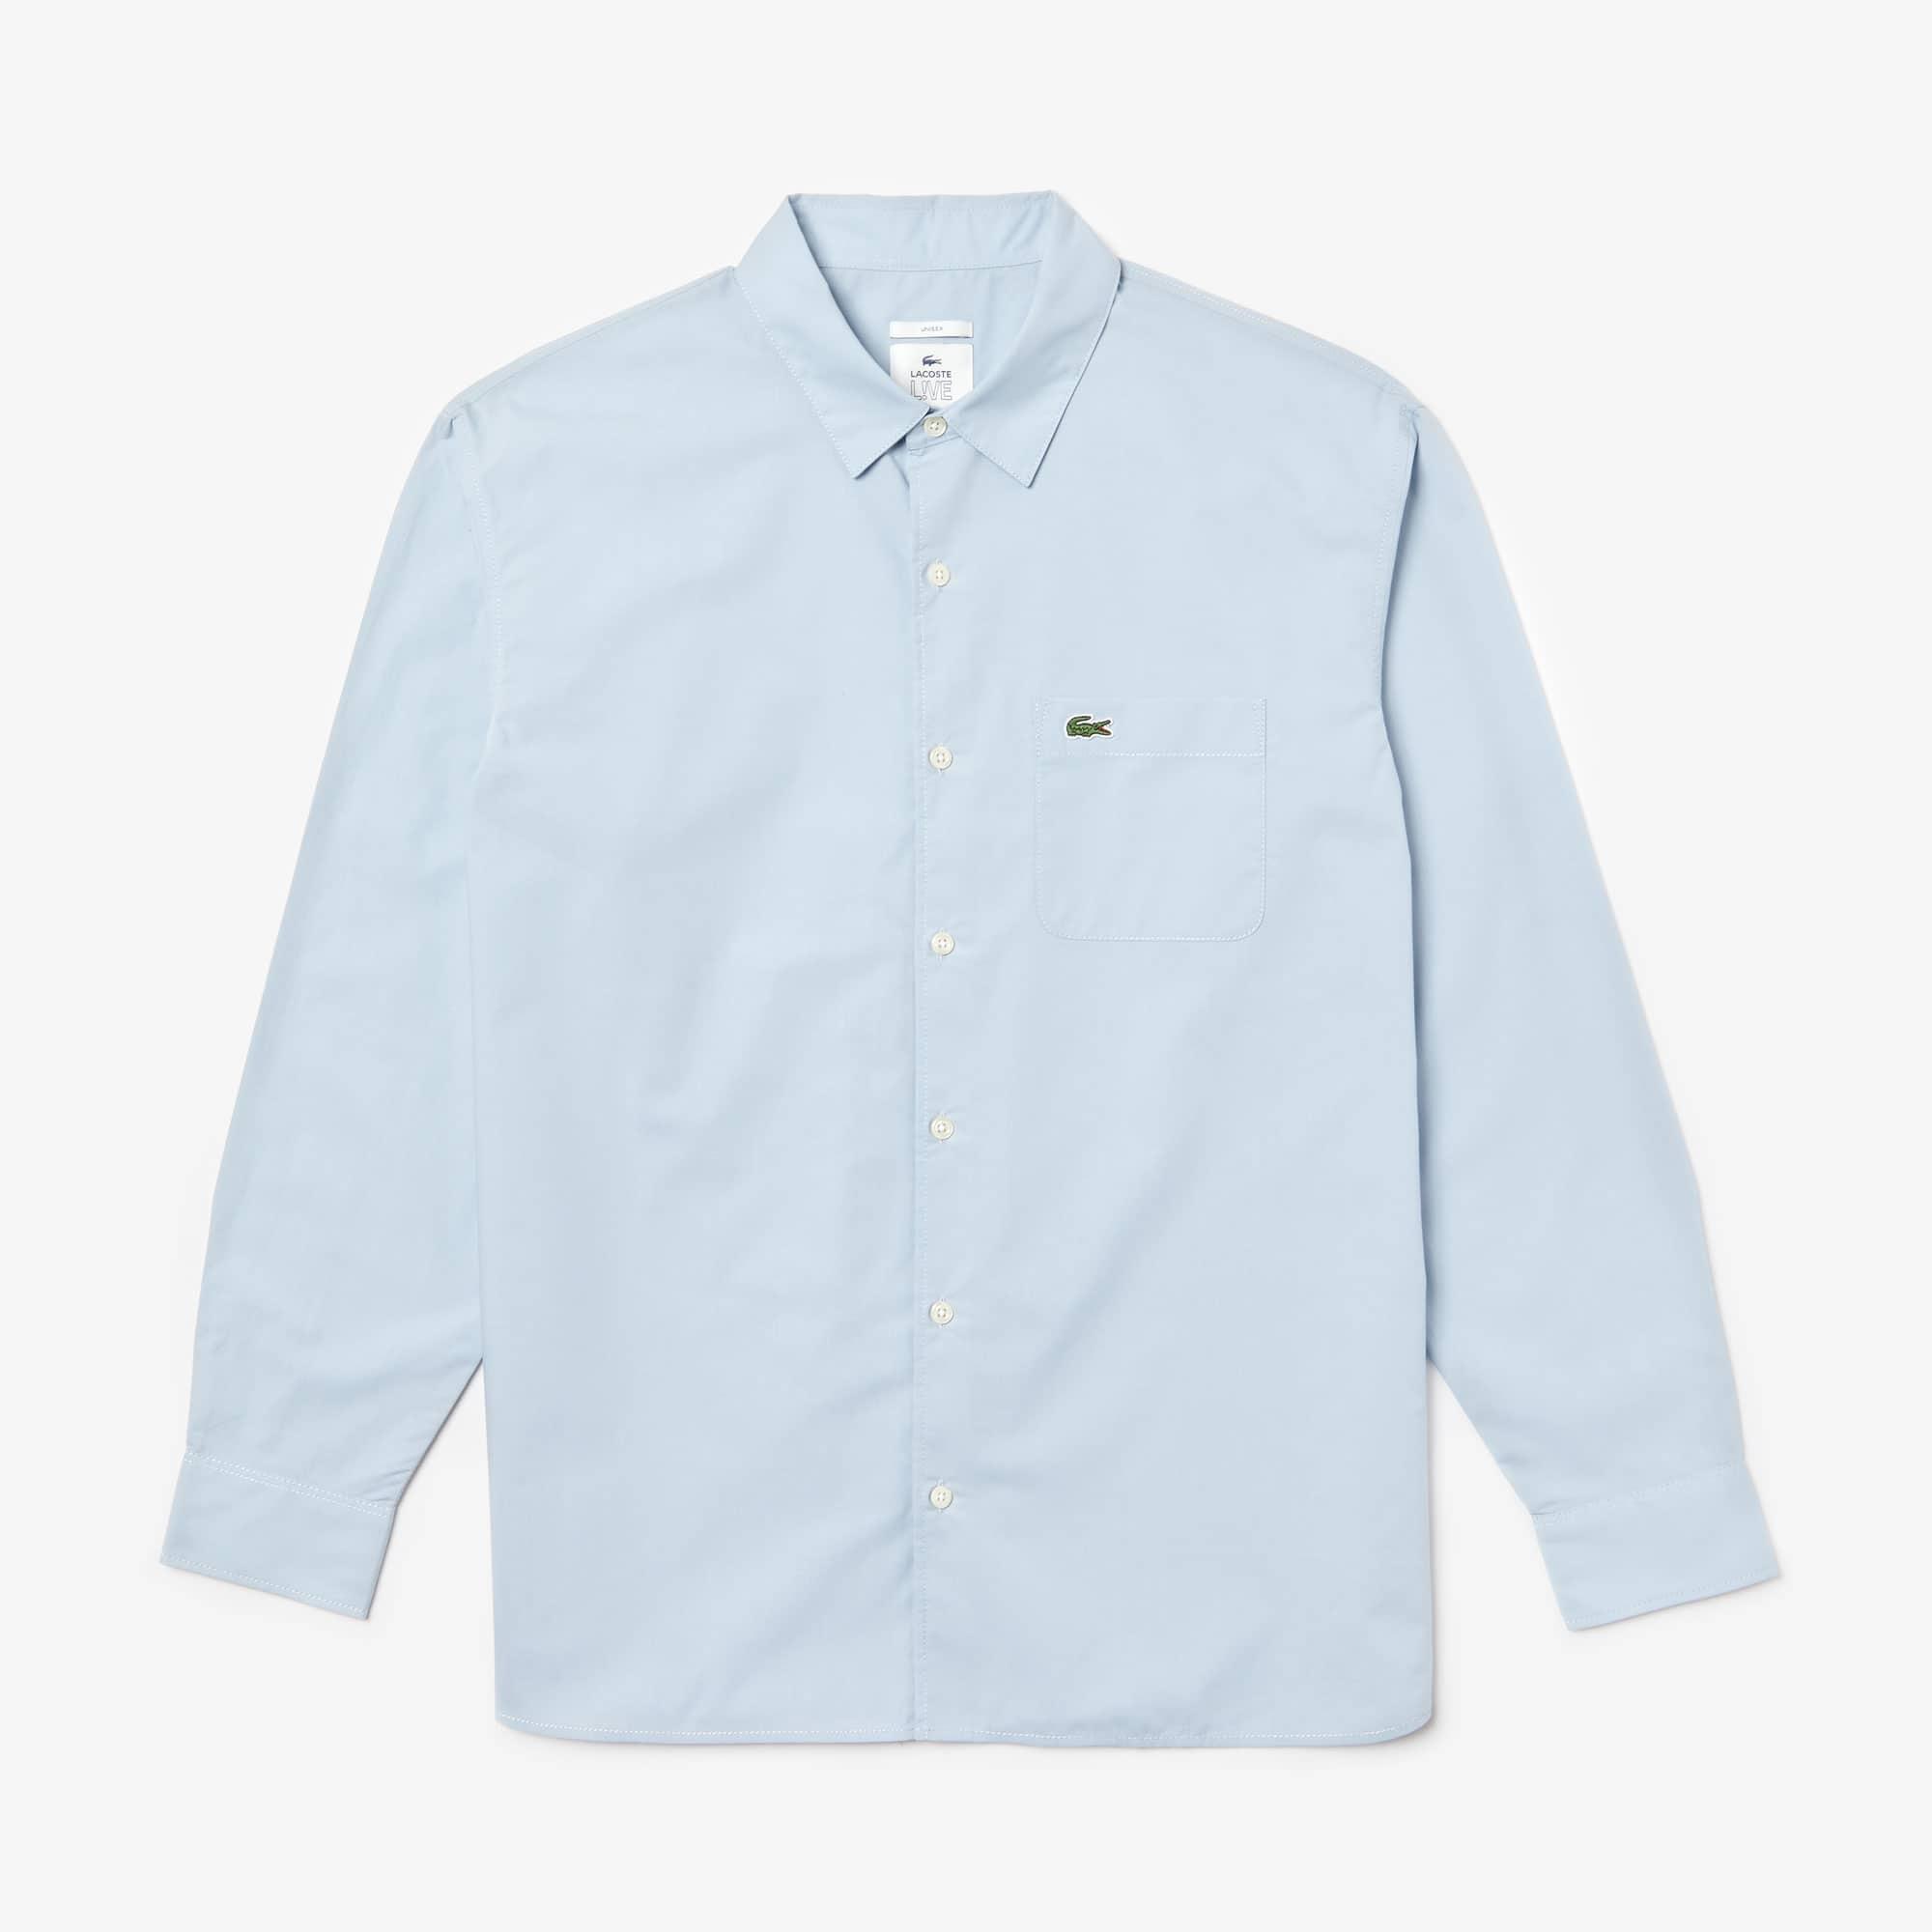 Unisex Lacoste LIVE Boxy Fit Cotton Poplin Shirt